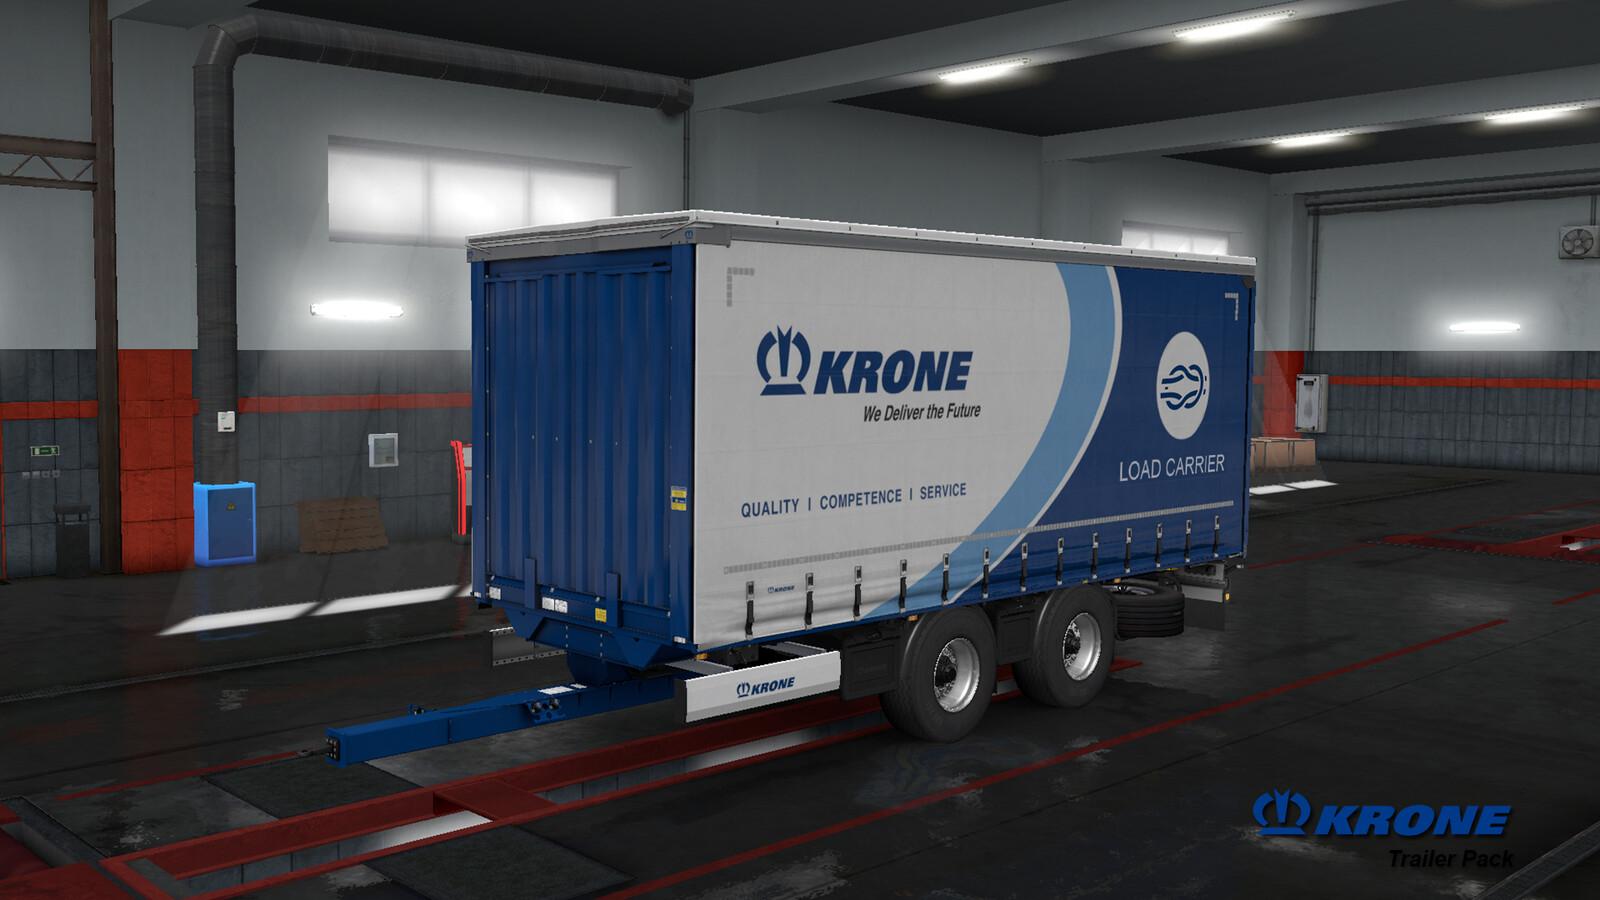 Load Carrier